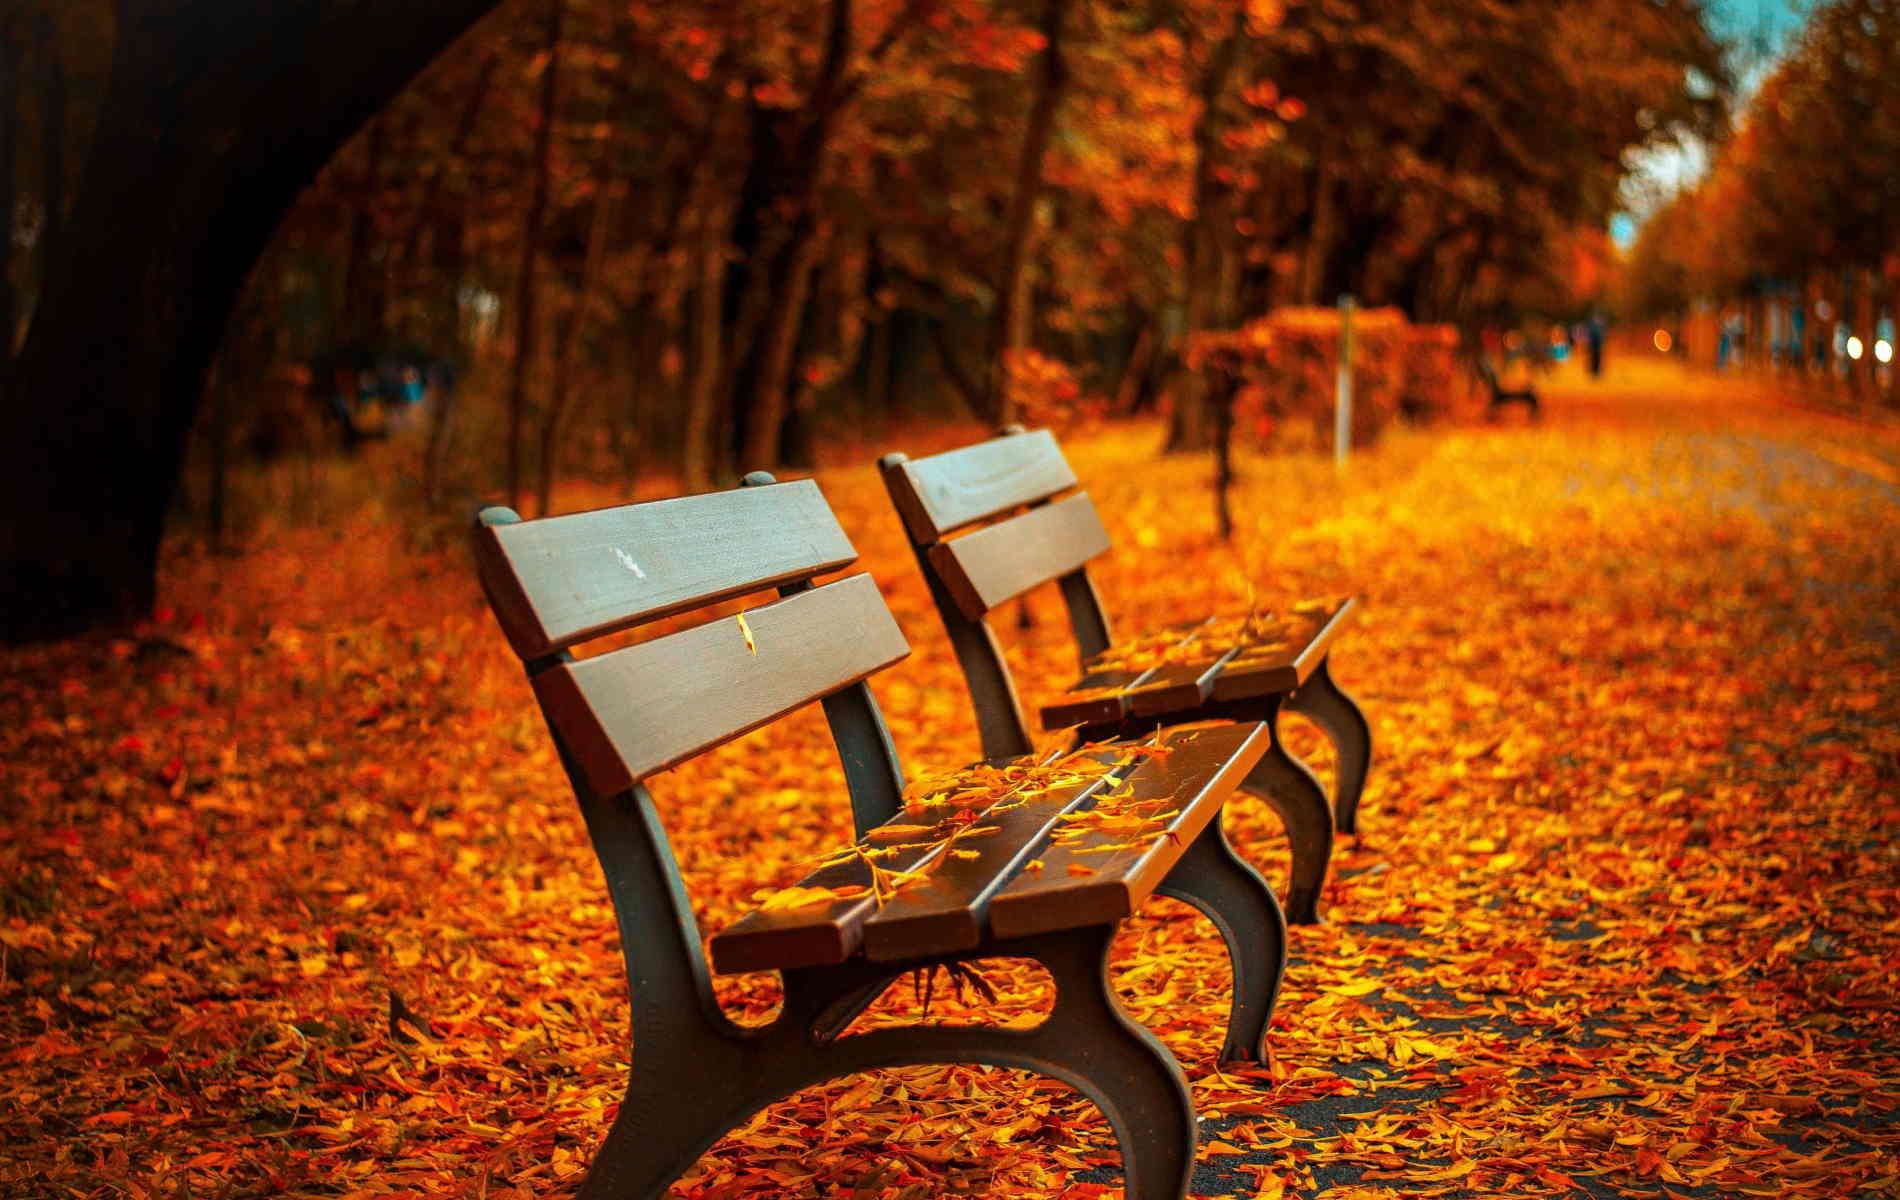 Autumn Desktop Wallpaper Forever Wallpapers